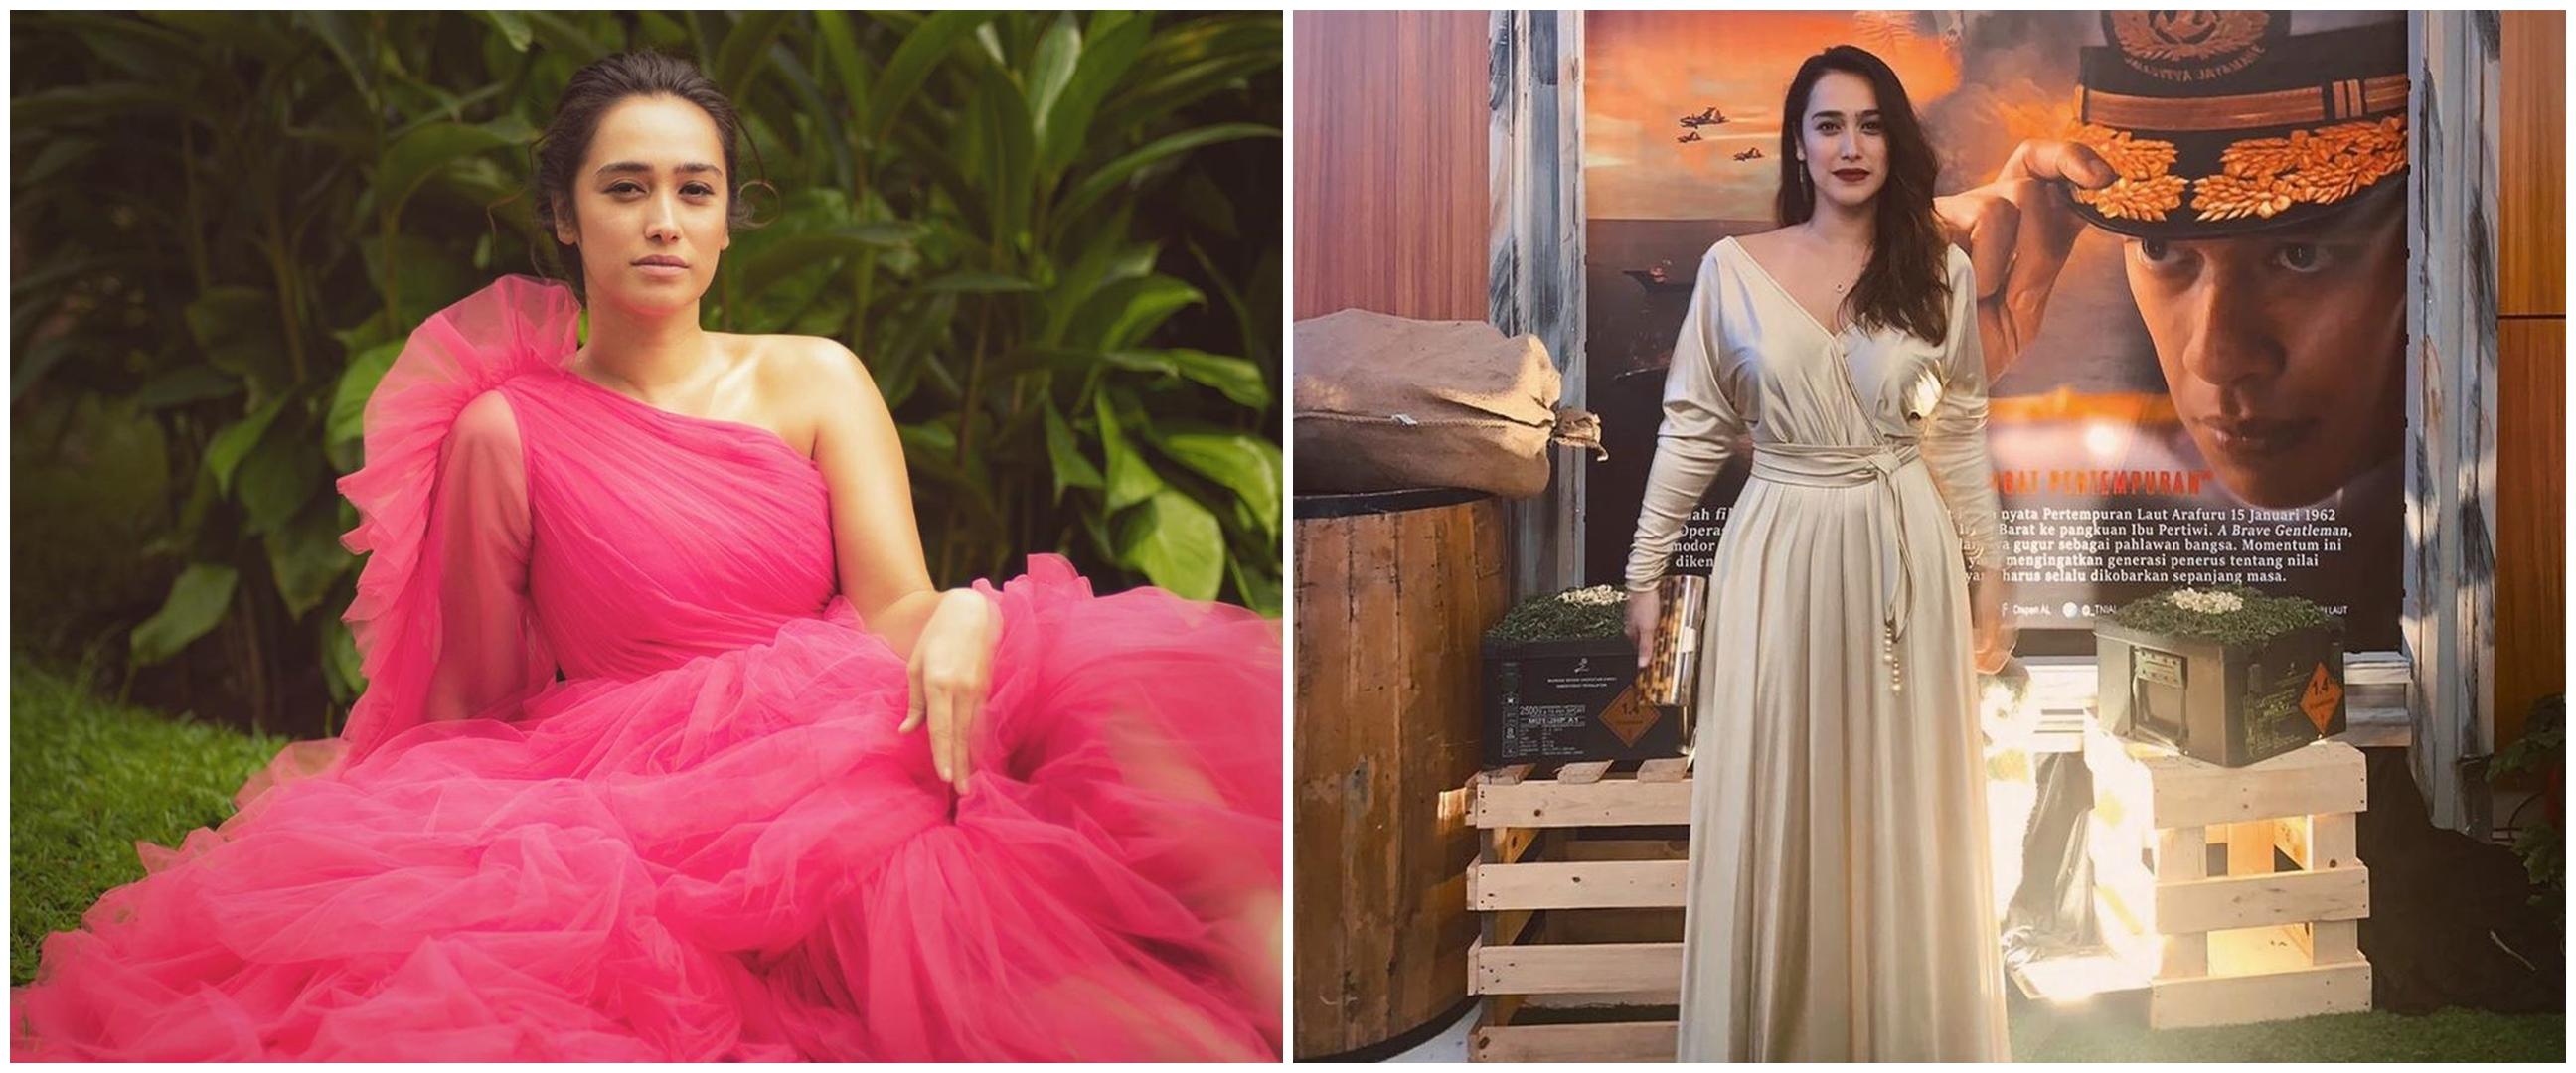 Tak pernah cukur bulu ketiak, ini 7 potret natural Alexandra Gottardo